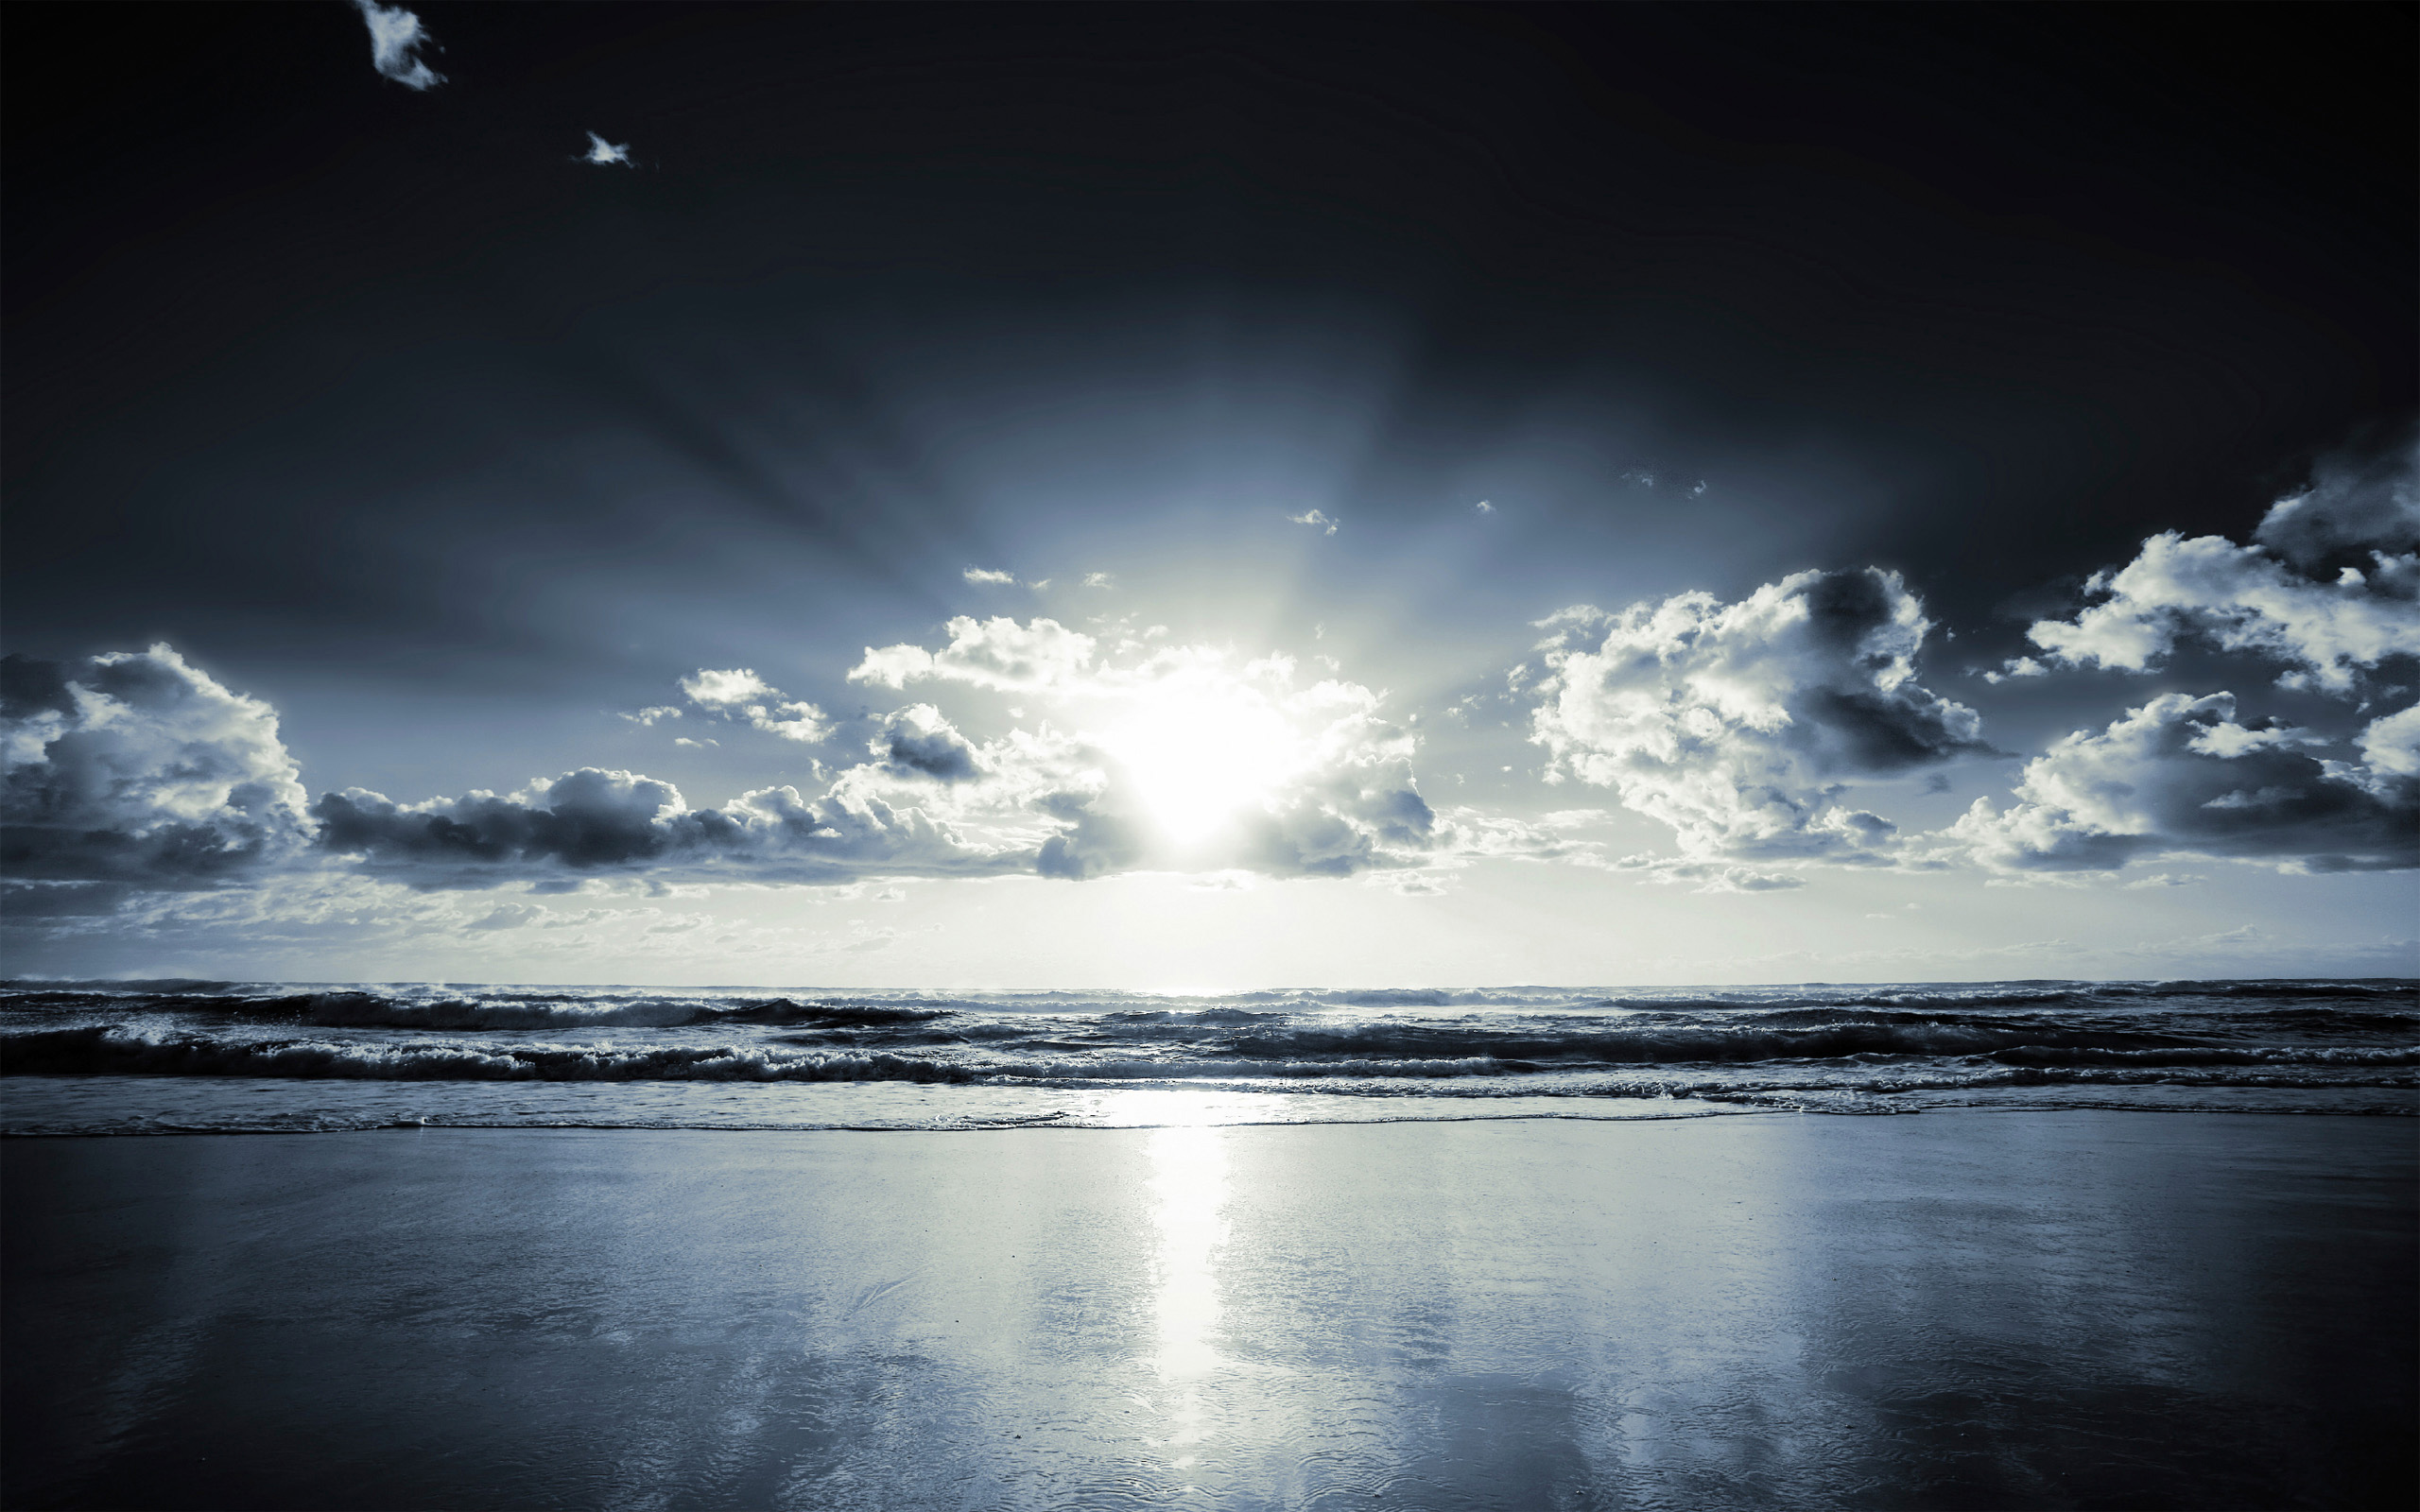 Horizon Landscape Ocean Shoreline 2560x1600